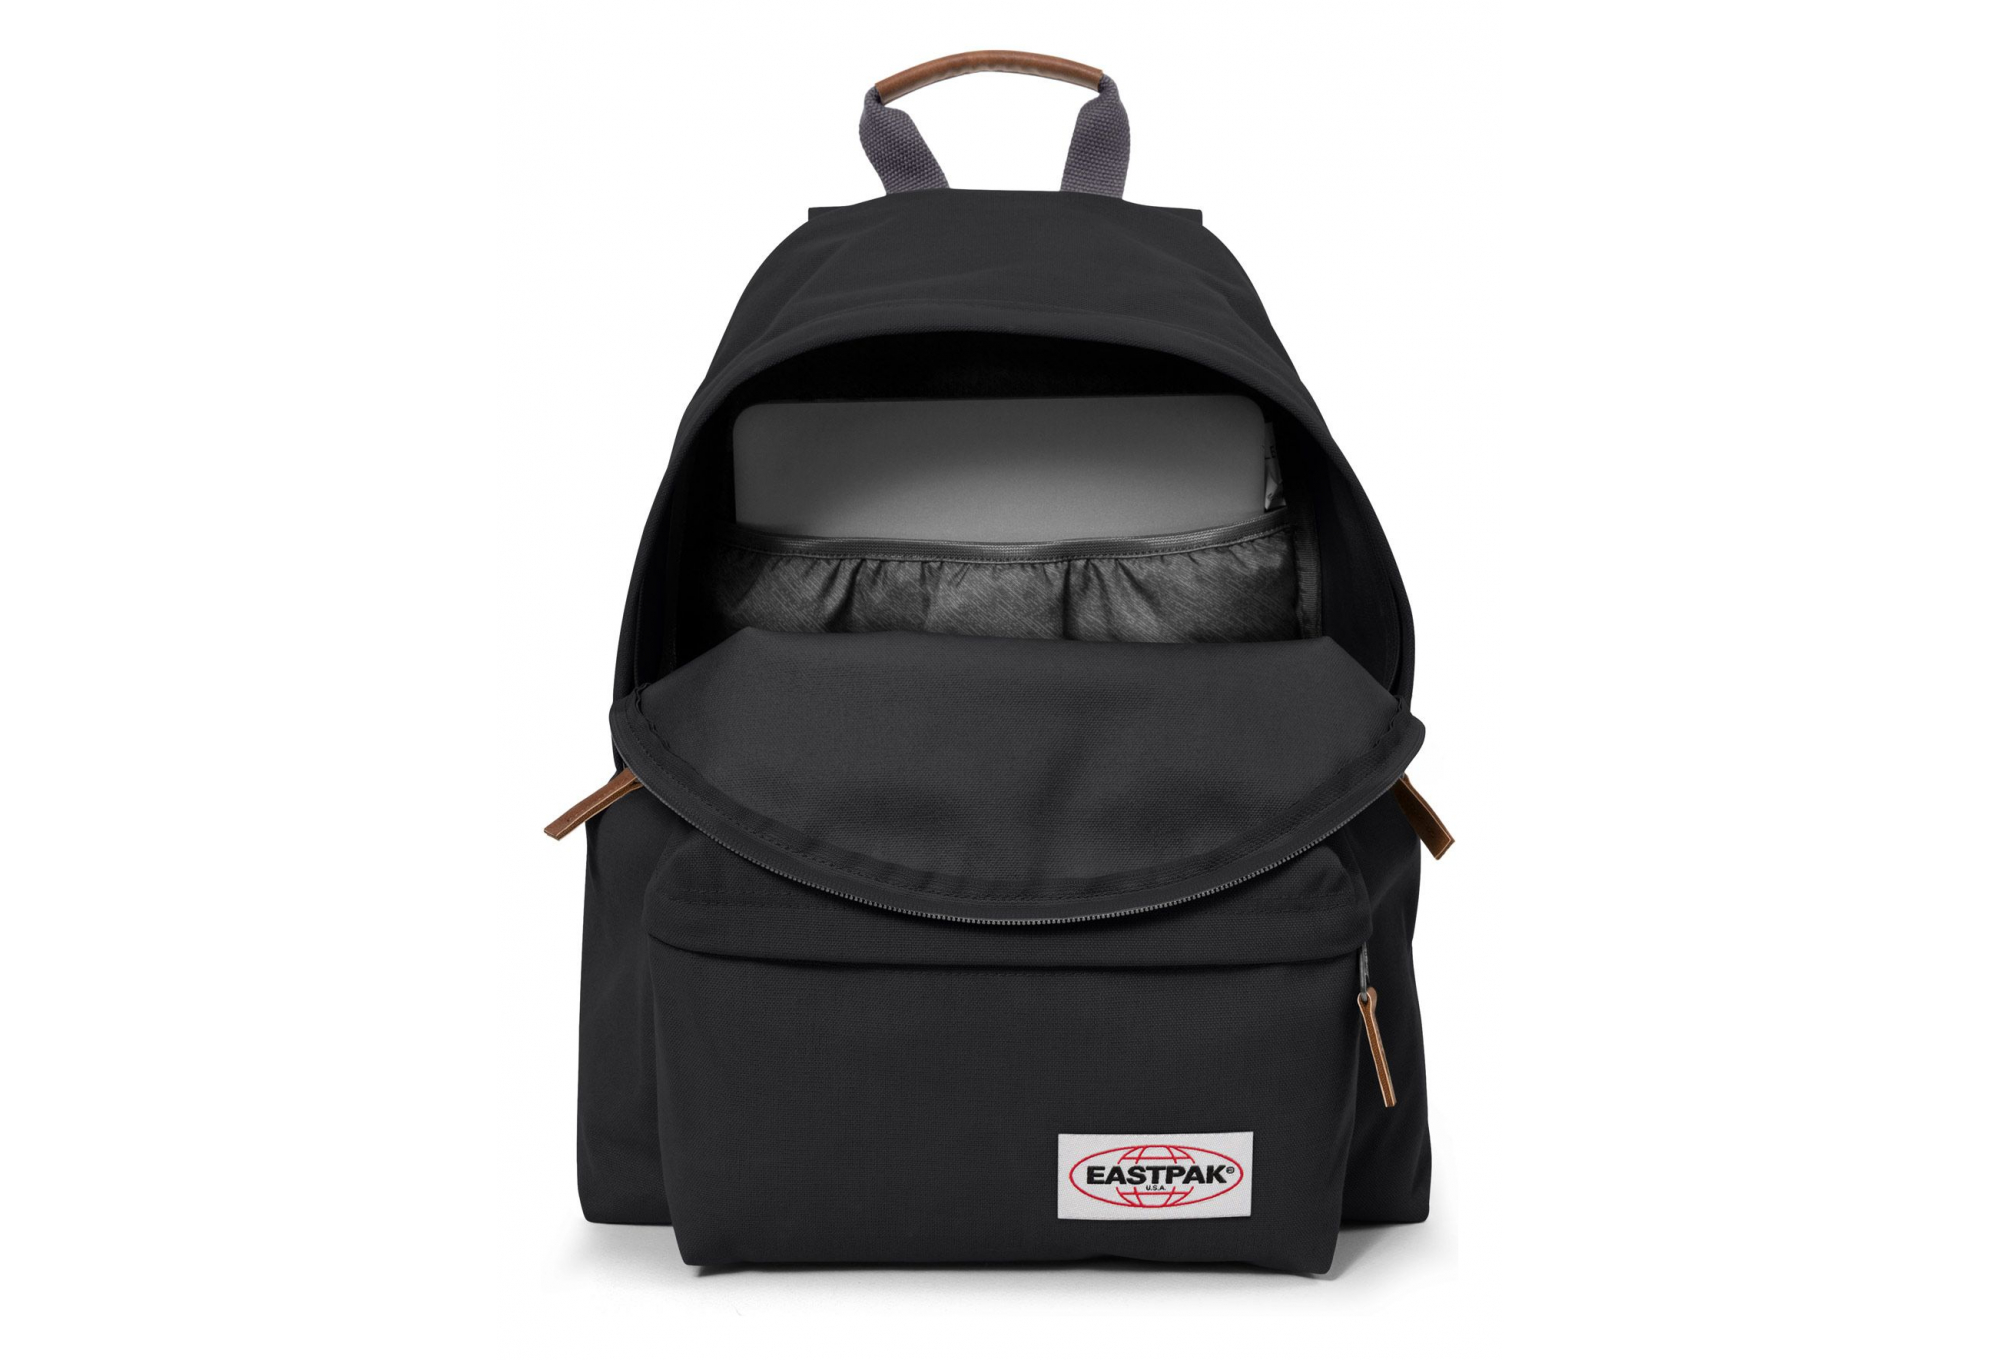 nog een kans goede service geautoriseerde site Eastpak Padded Pak'r Backpack Opgrade Black